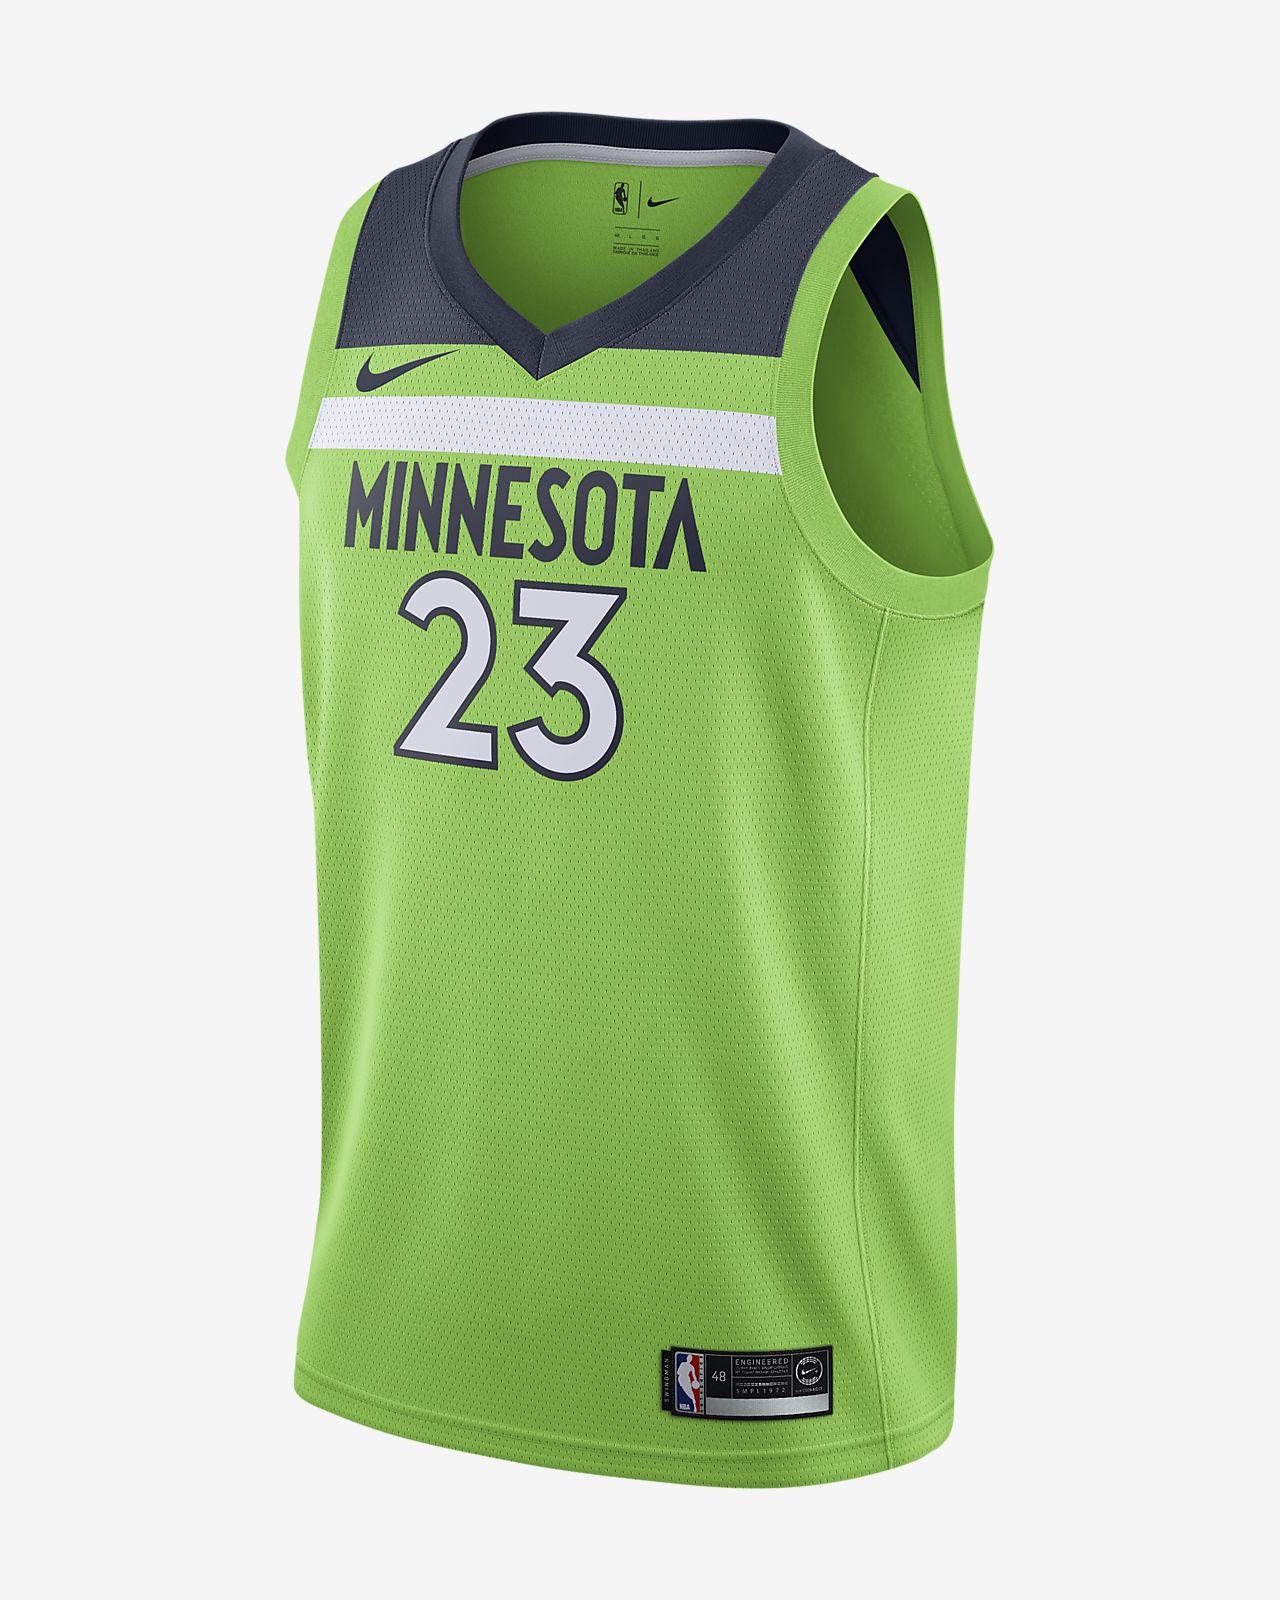 22e61ff85 Men s Nike NBA Connected Jersey. Jimmy Butler Statement Edition Swingman (Minnesota  Timberwolves)